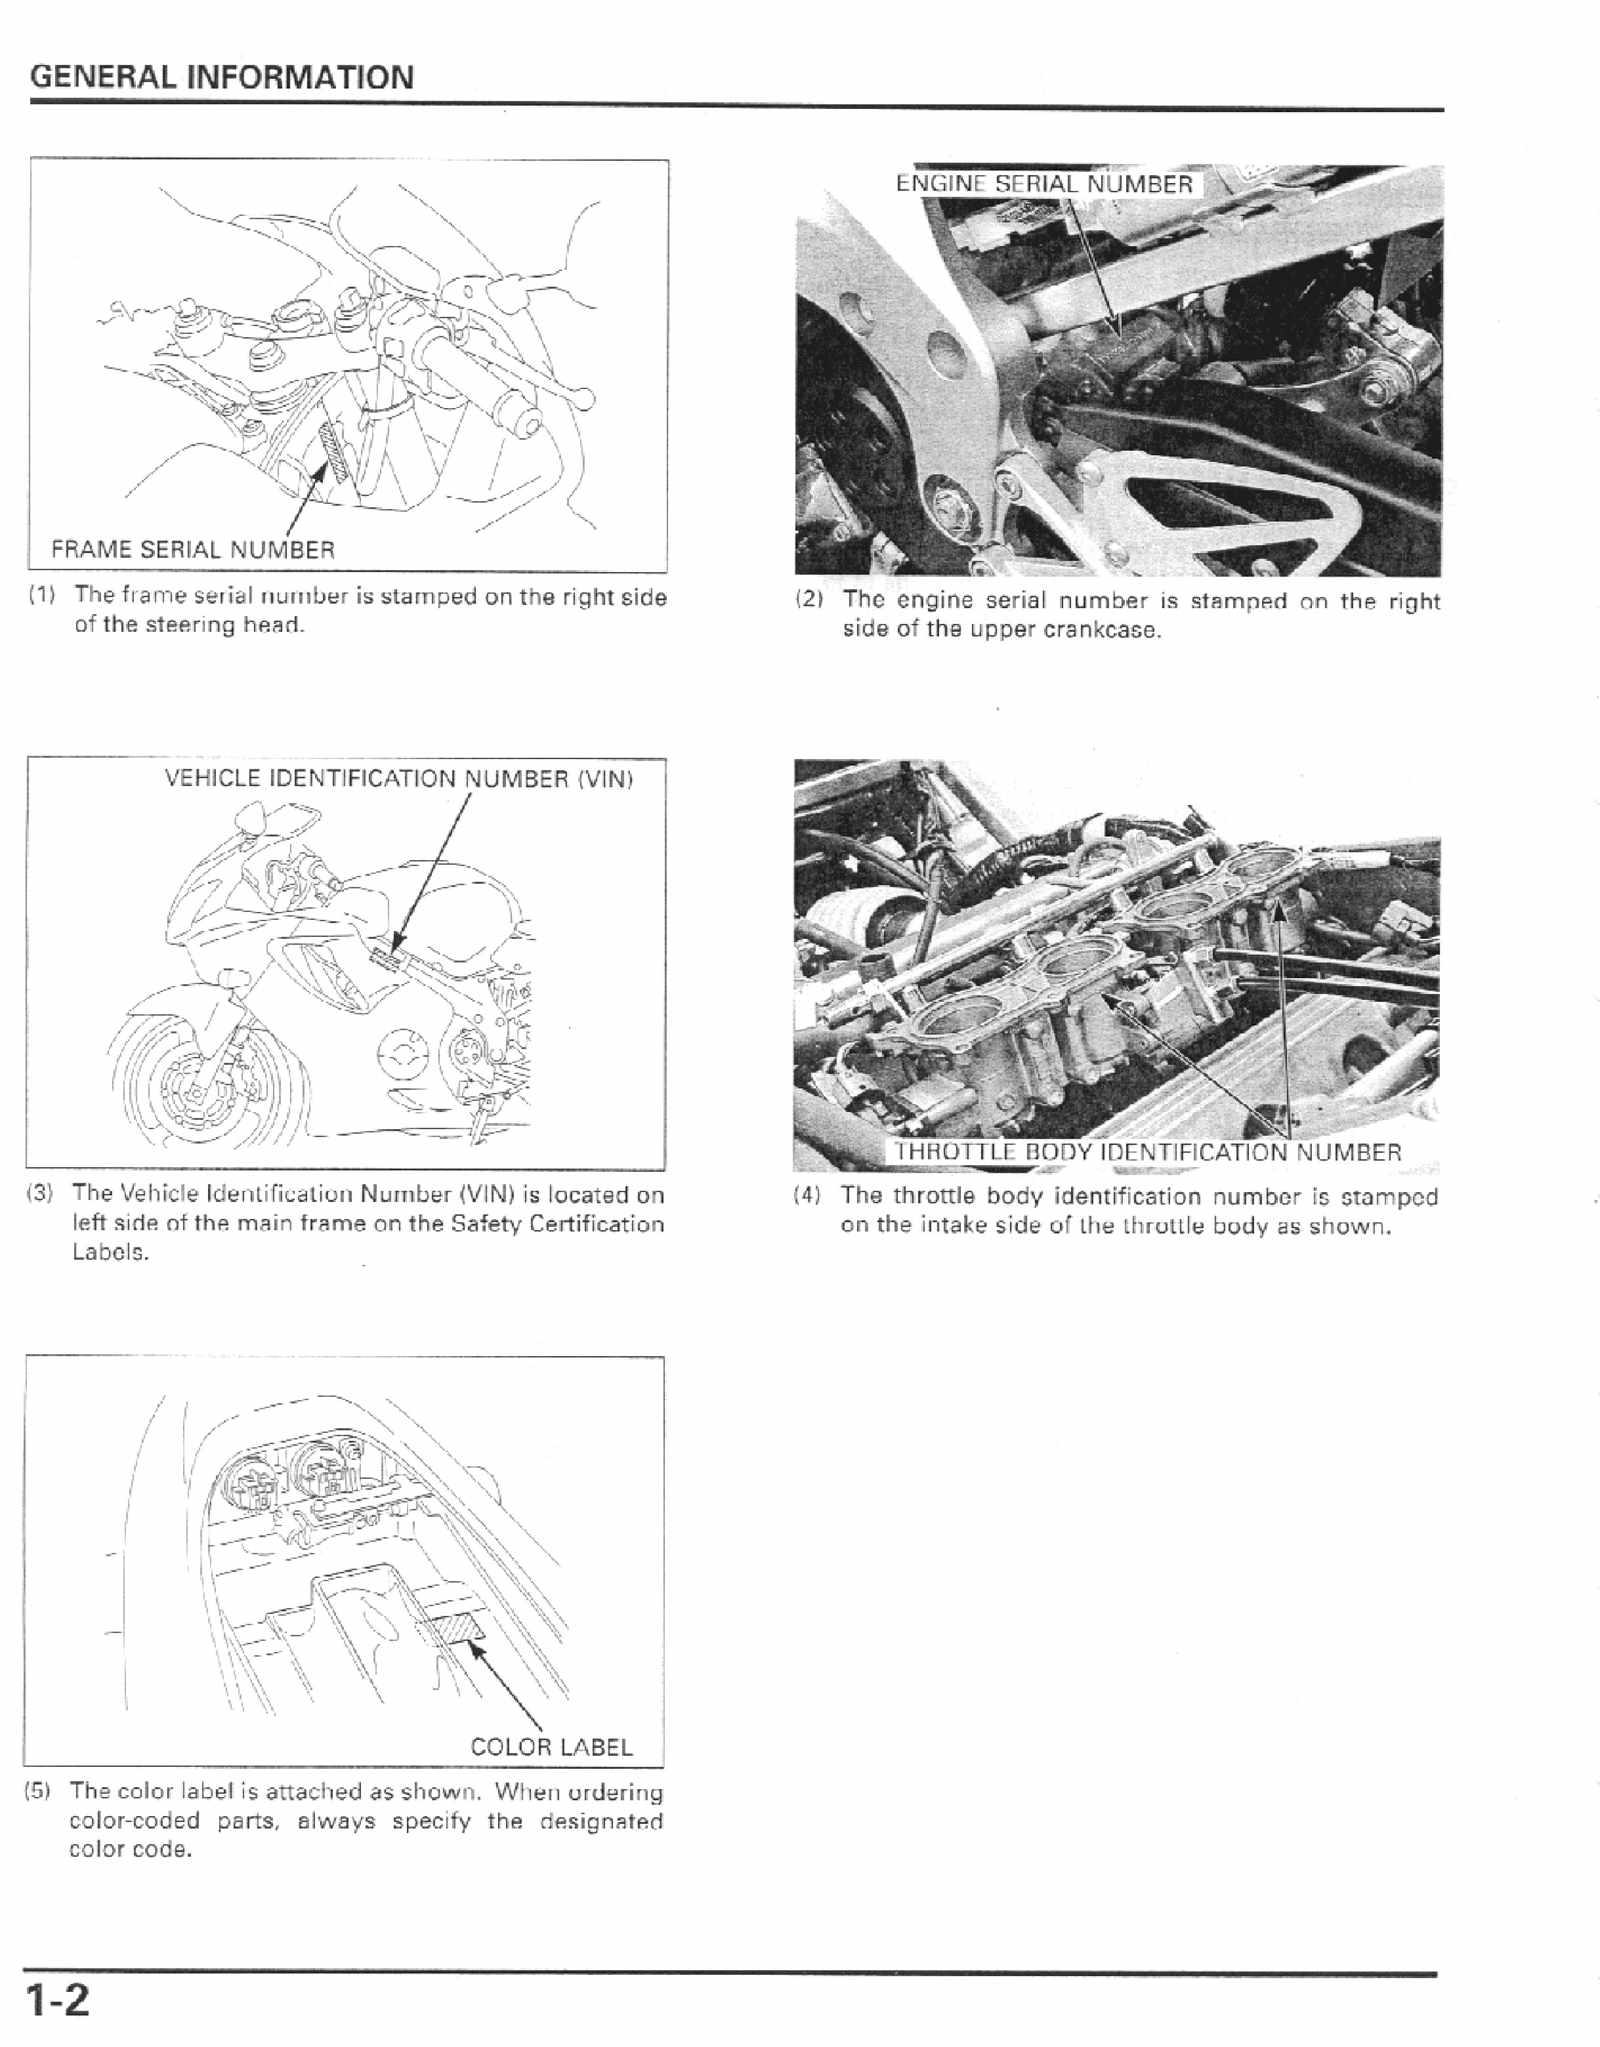 Honda CBR600 F4i 01-03 Service Manual Free Download